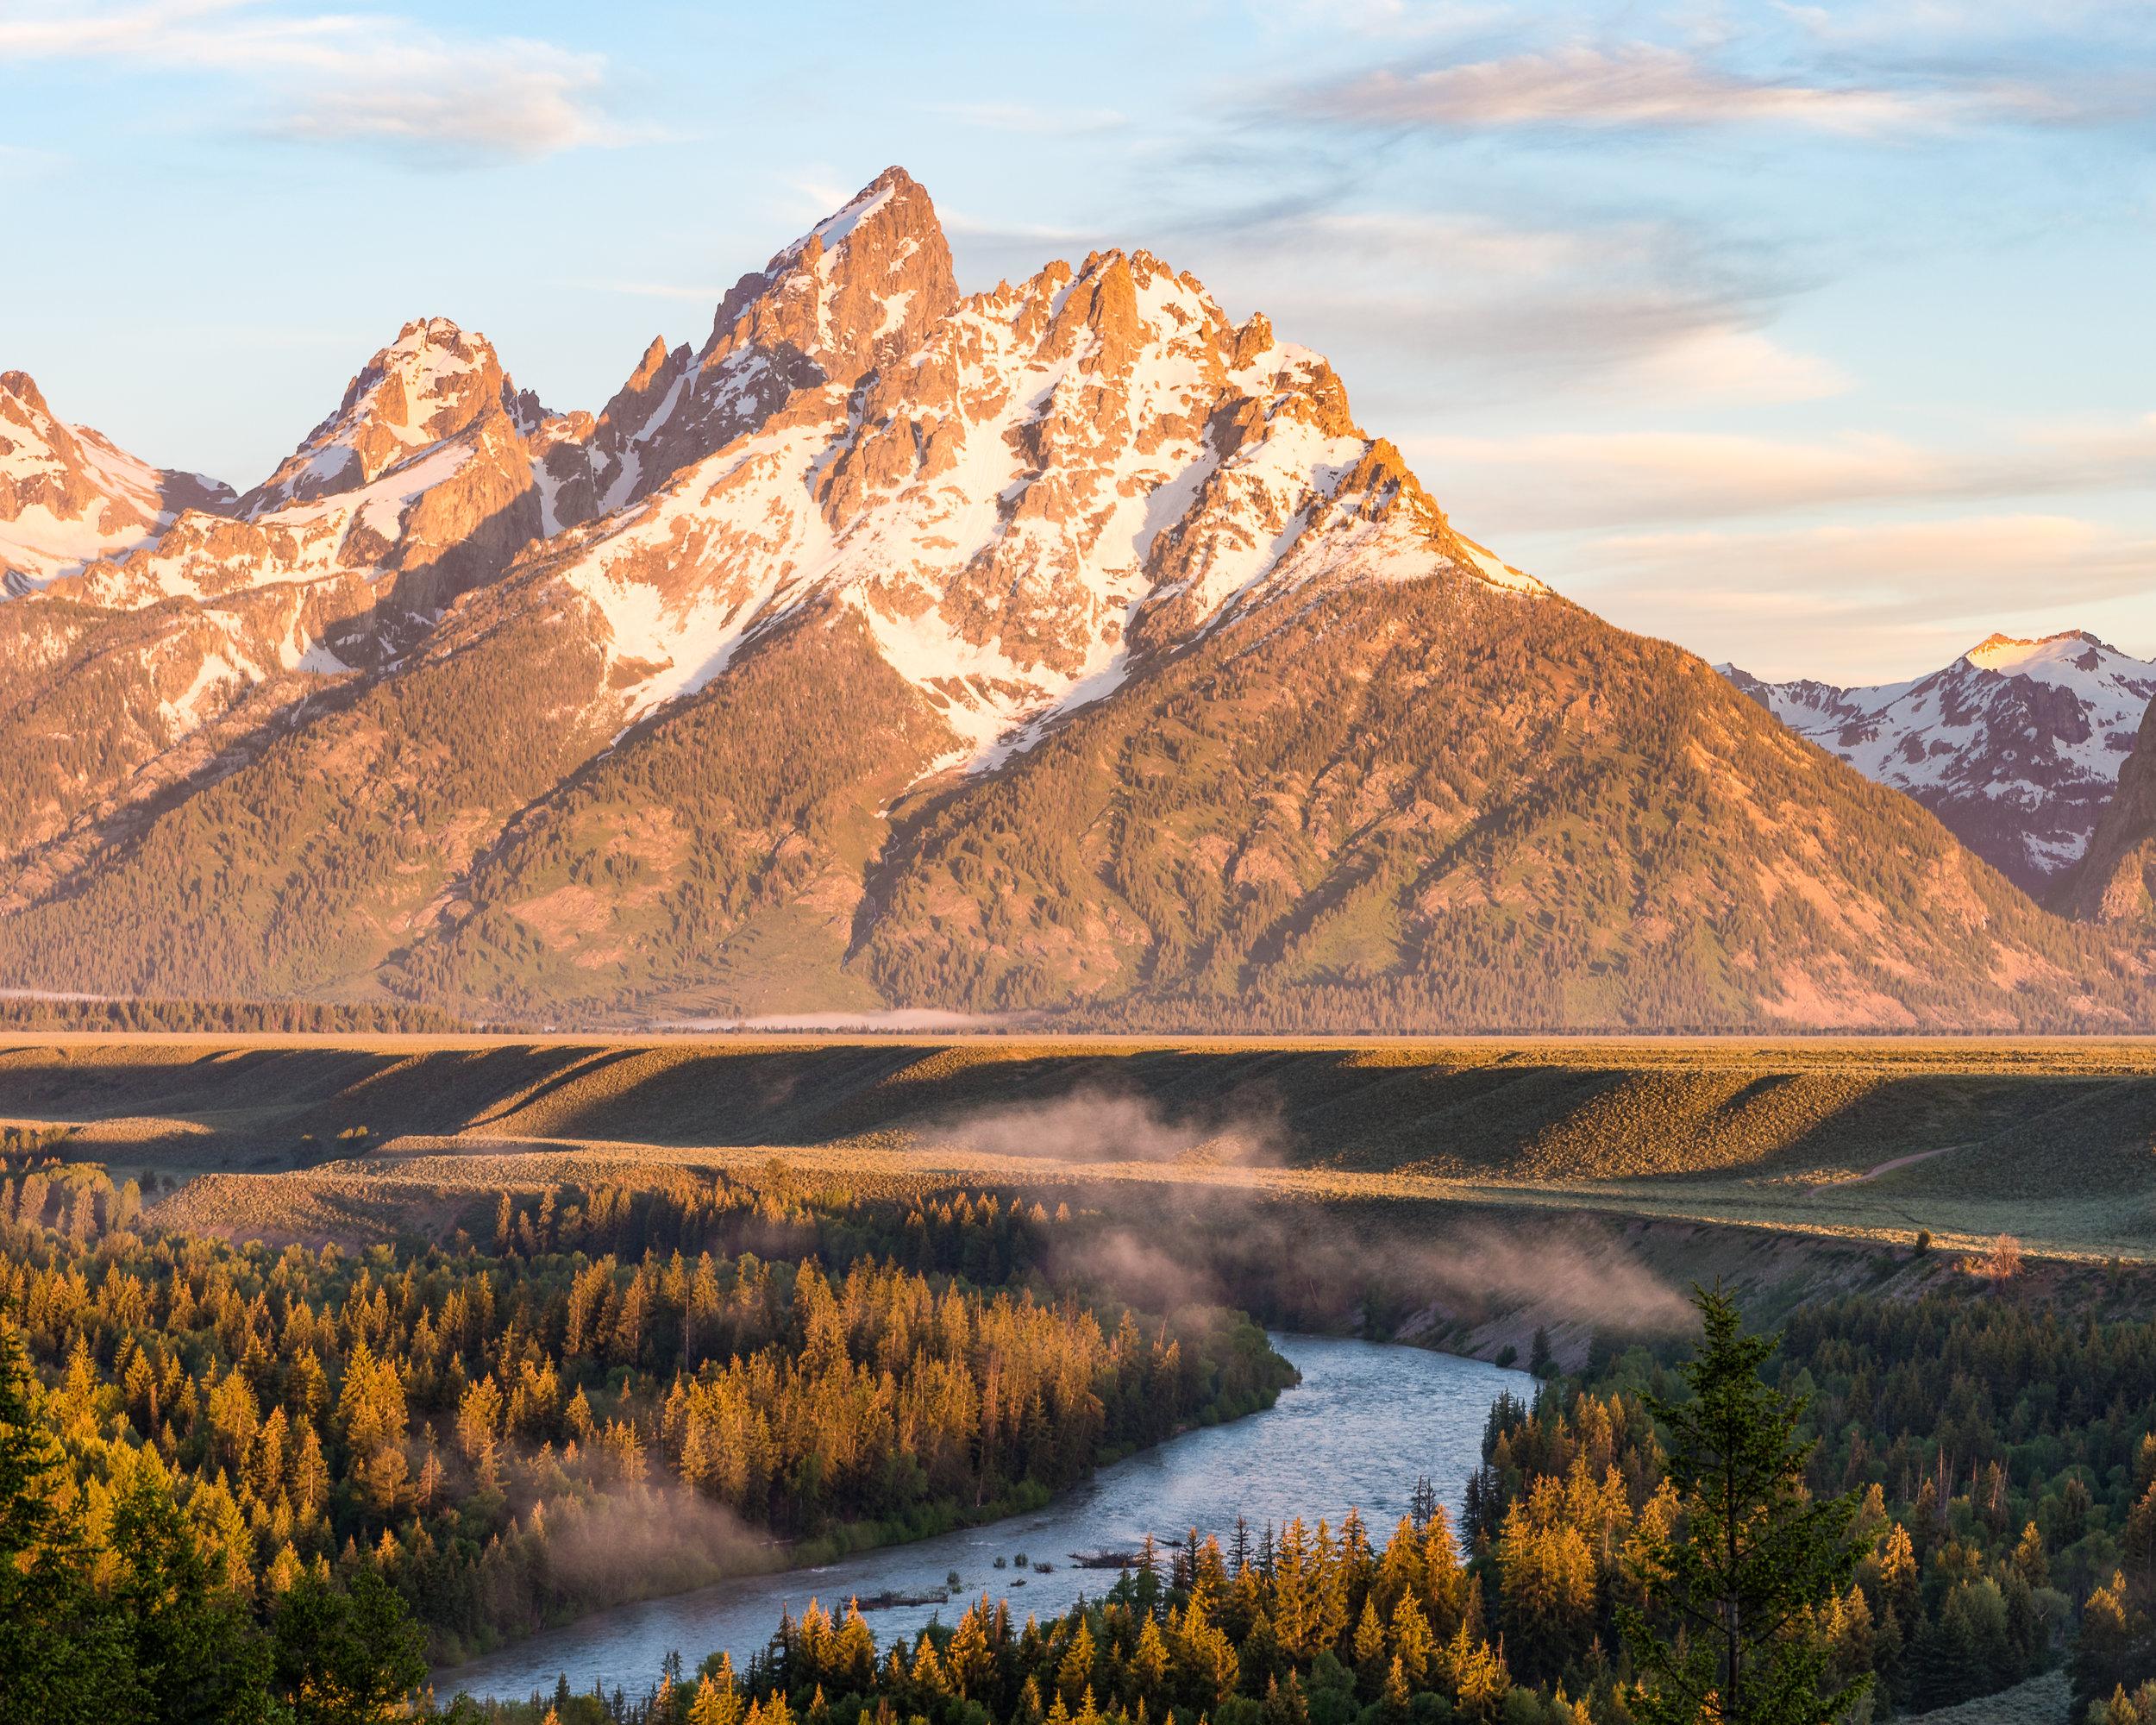 @dearabbybird - Grand Teton National Park, WY